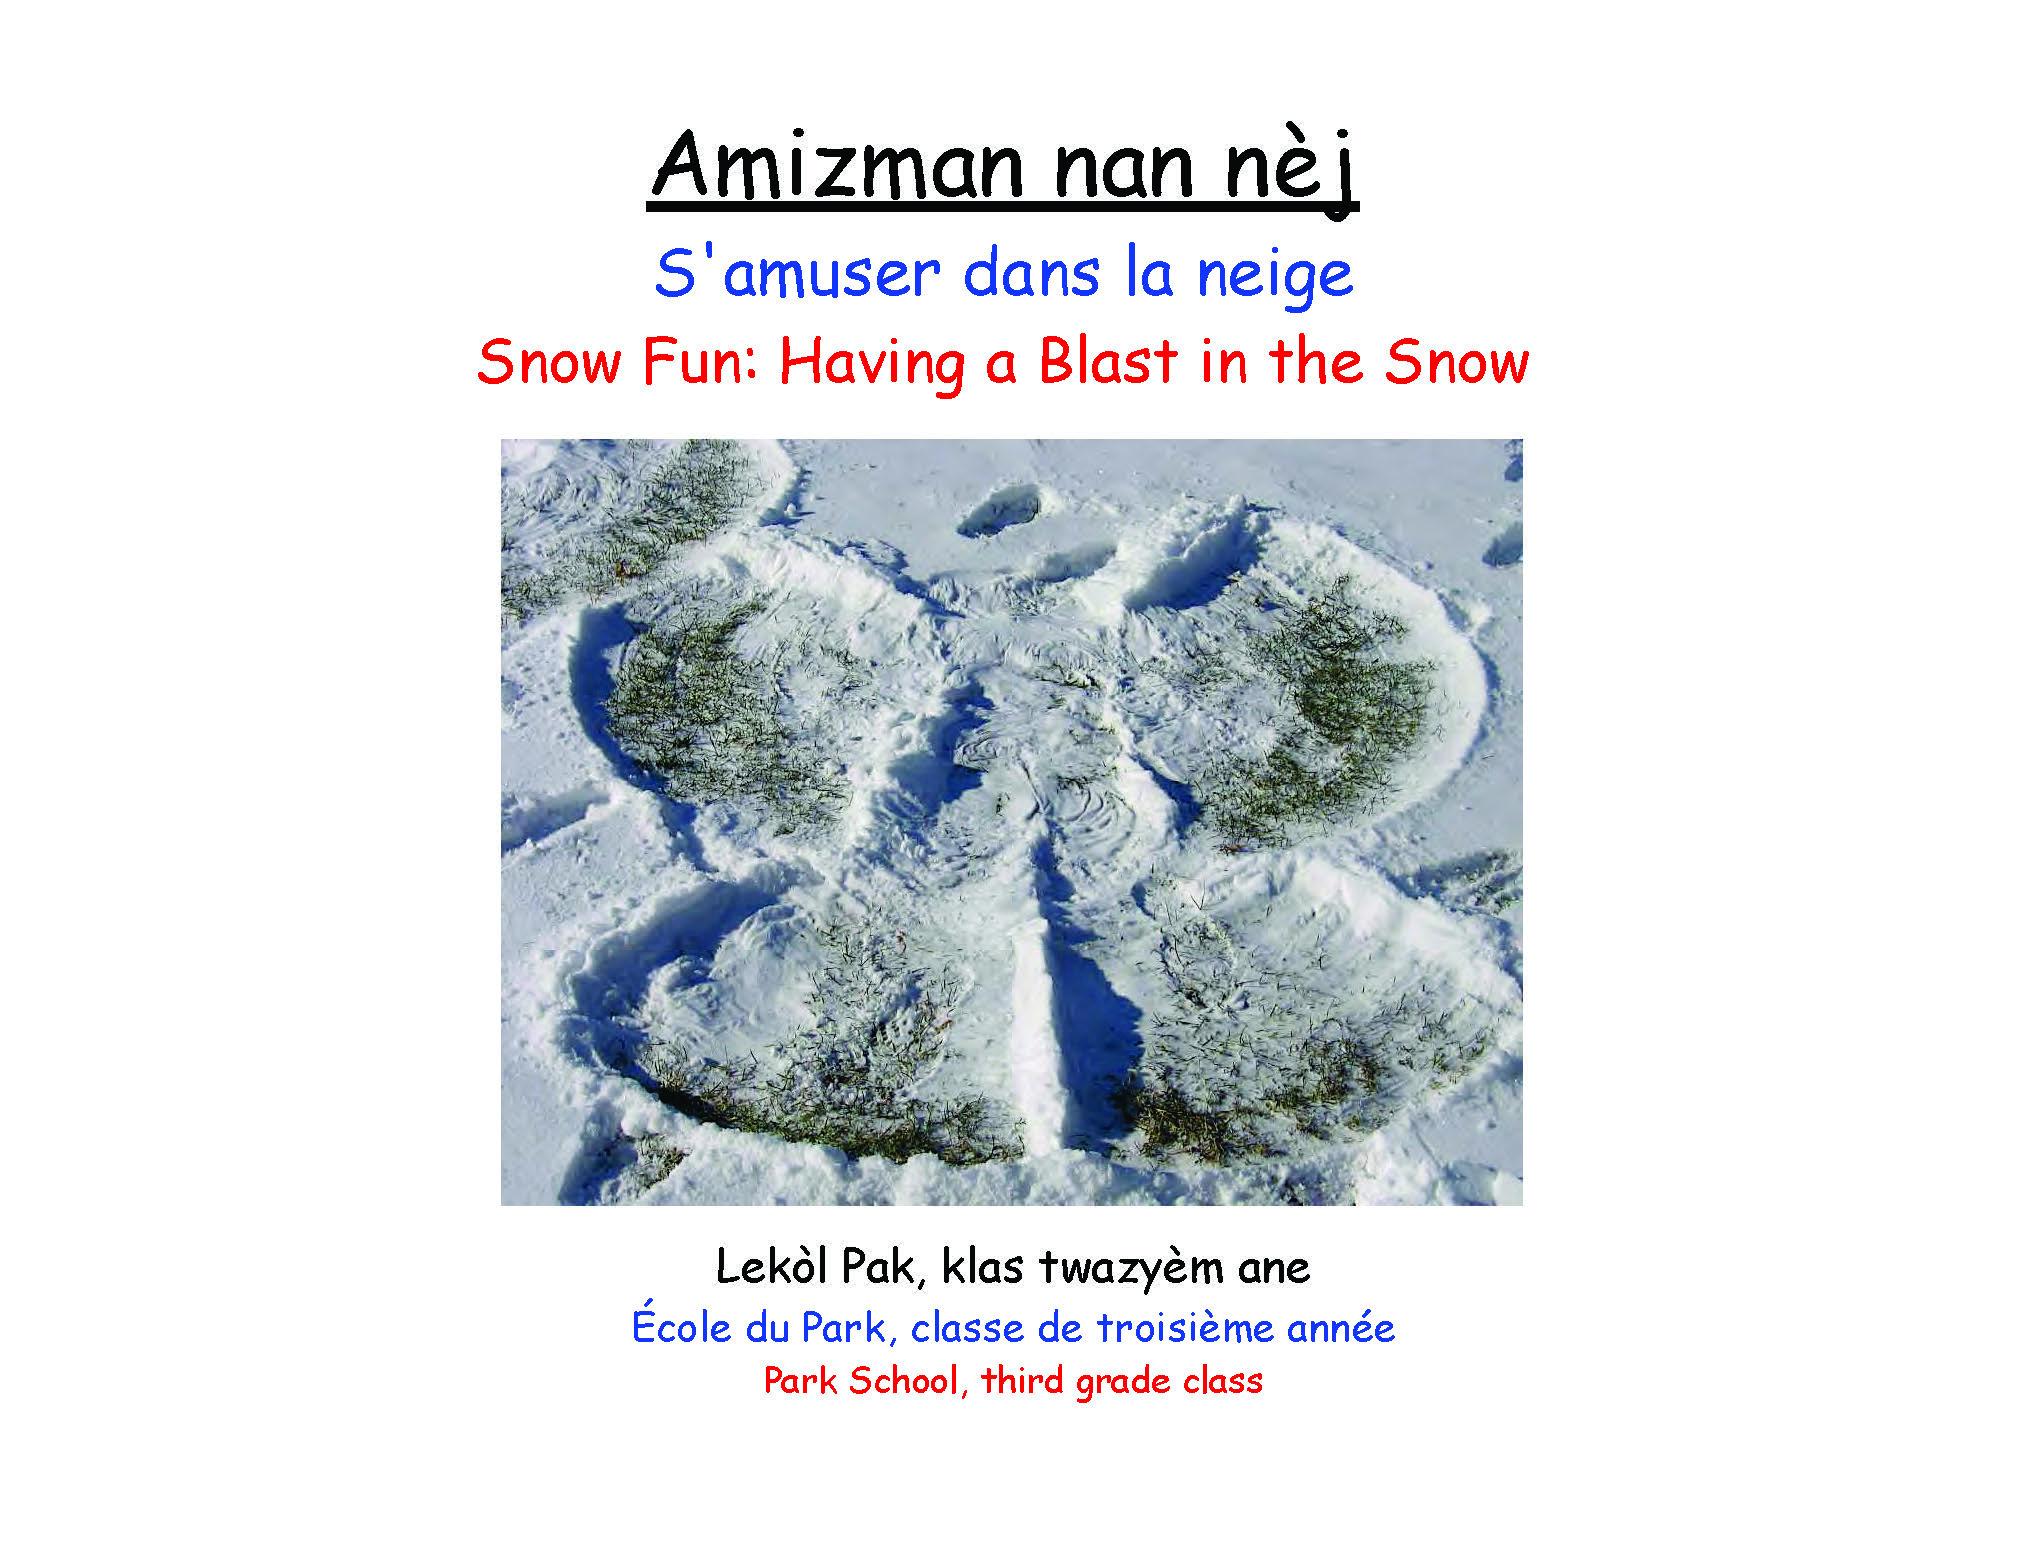 Amizman nan nèj / Fun in the snow